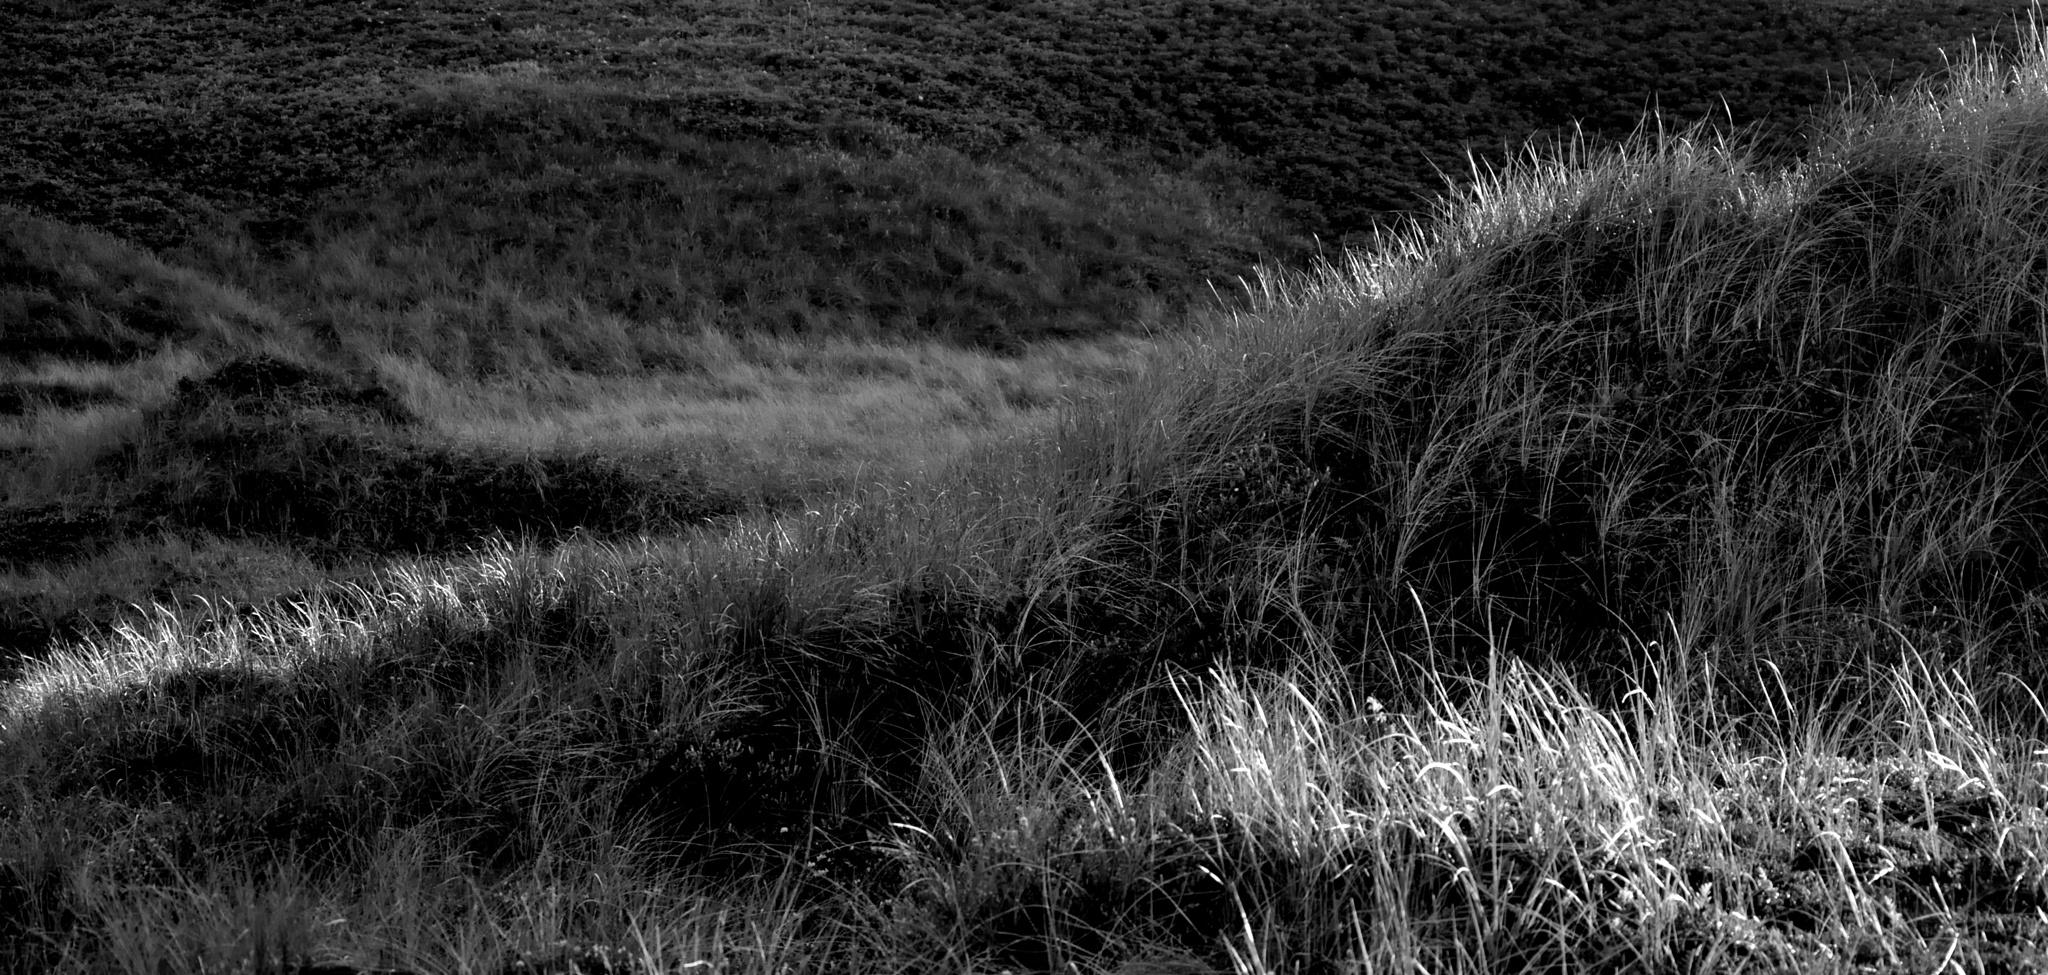 dunes by Poul-Erik Riis